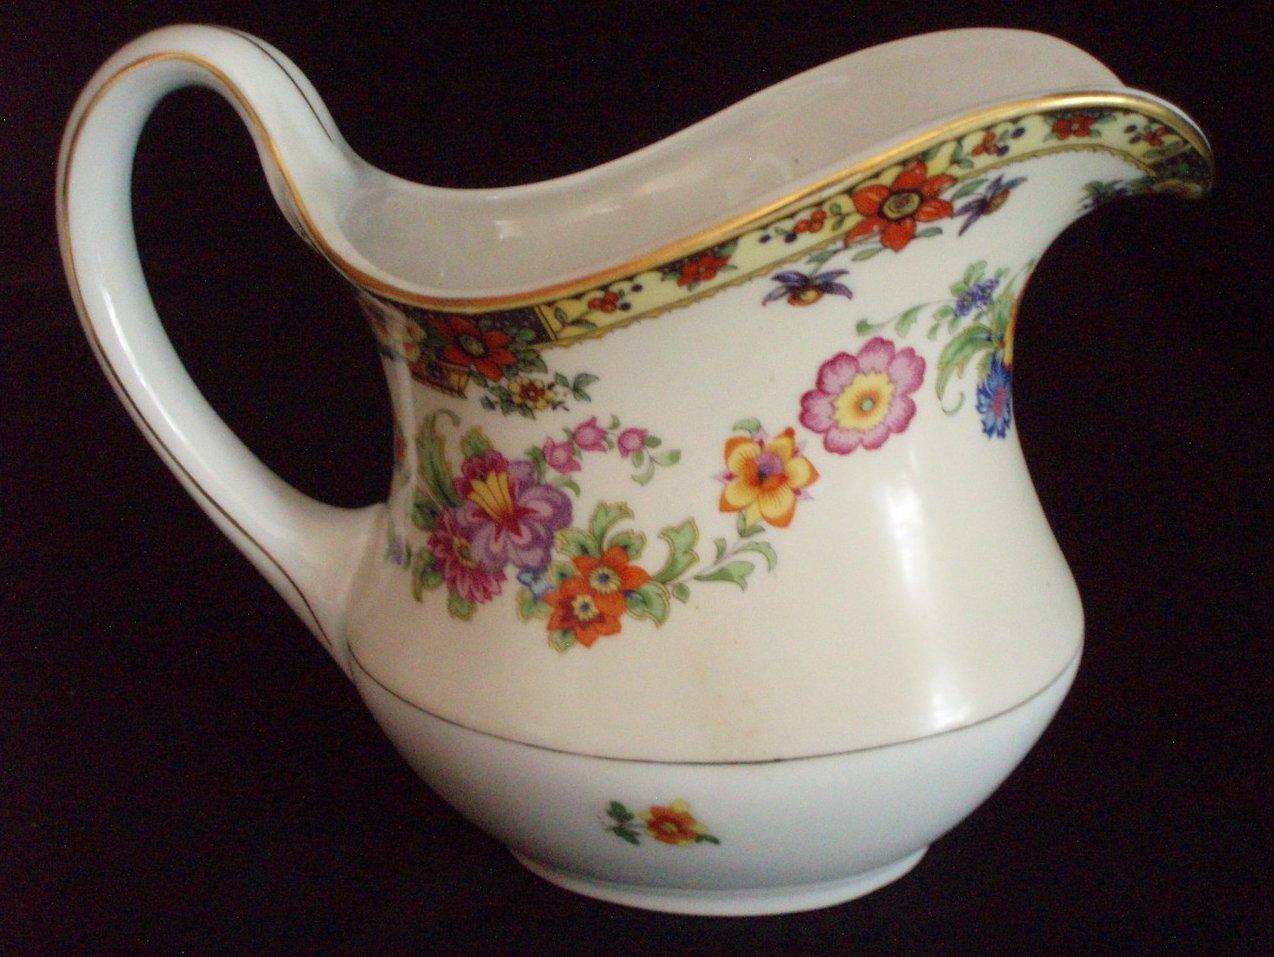 Vintage 32 oz floral ironstone milk pitcher